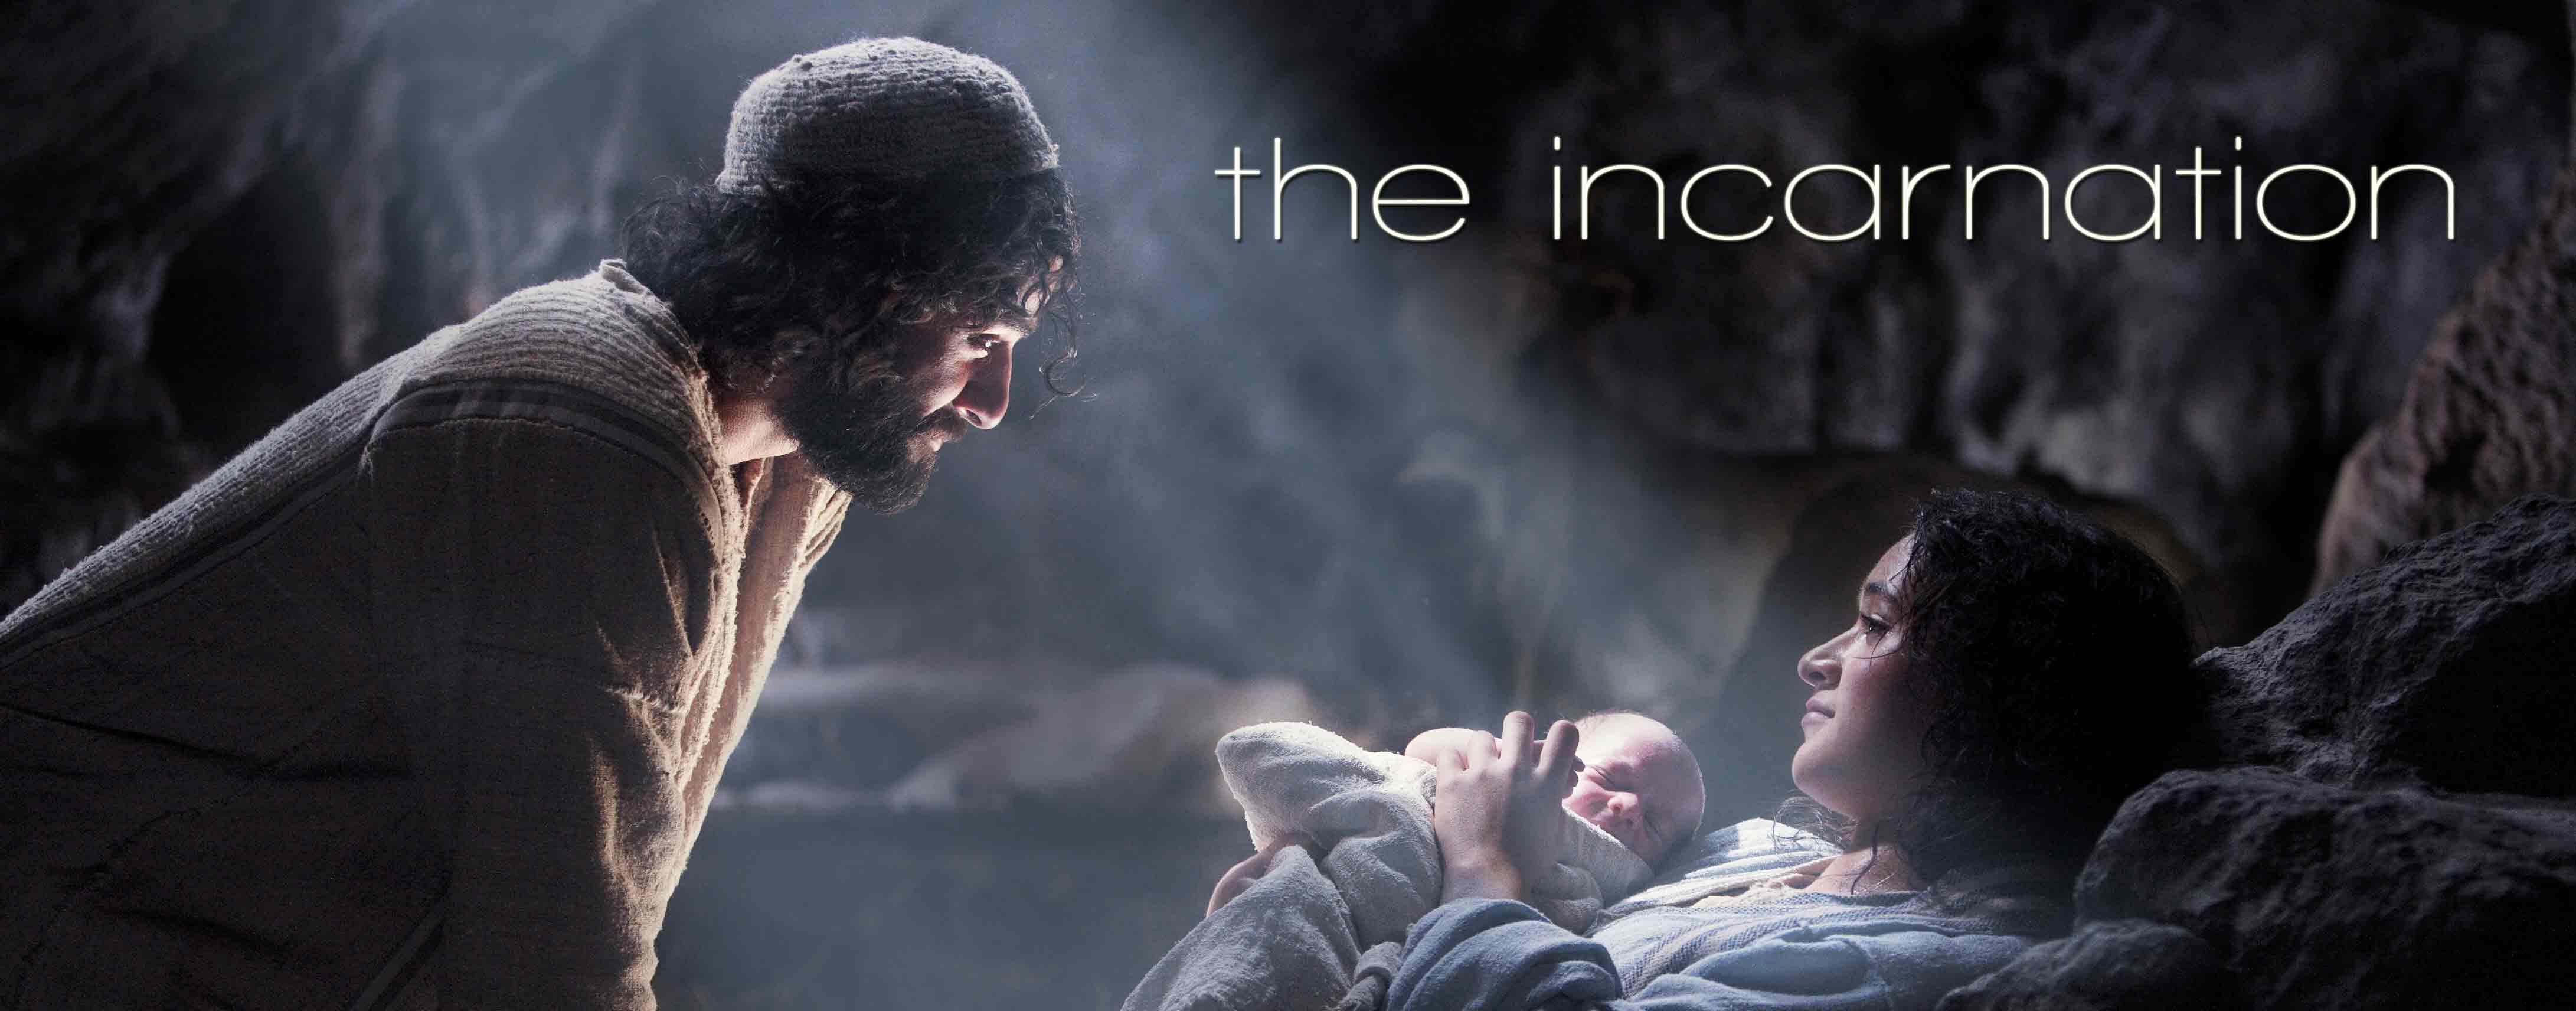 incarnation-2